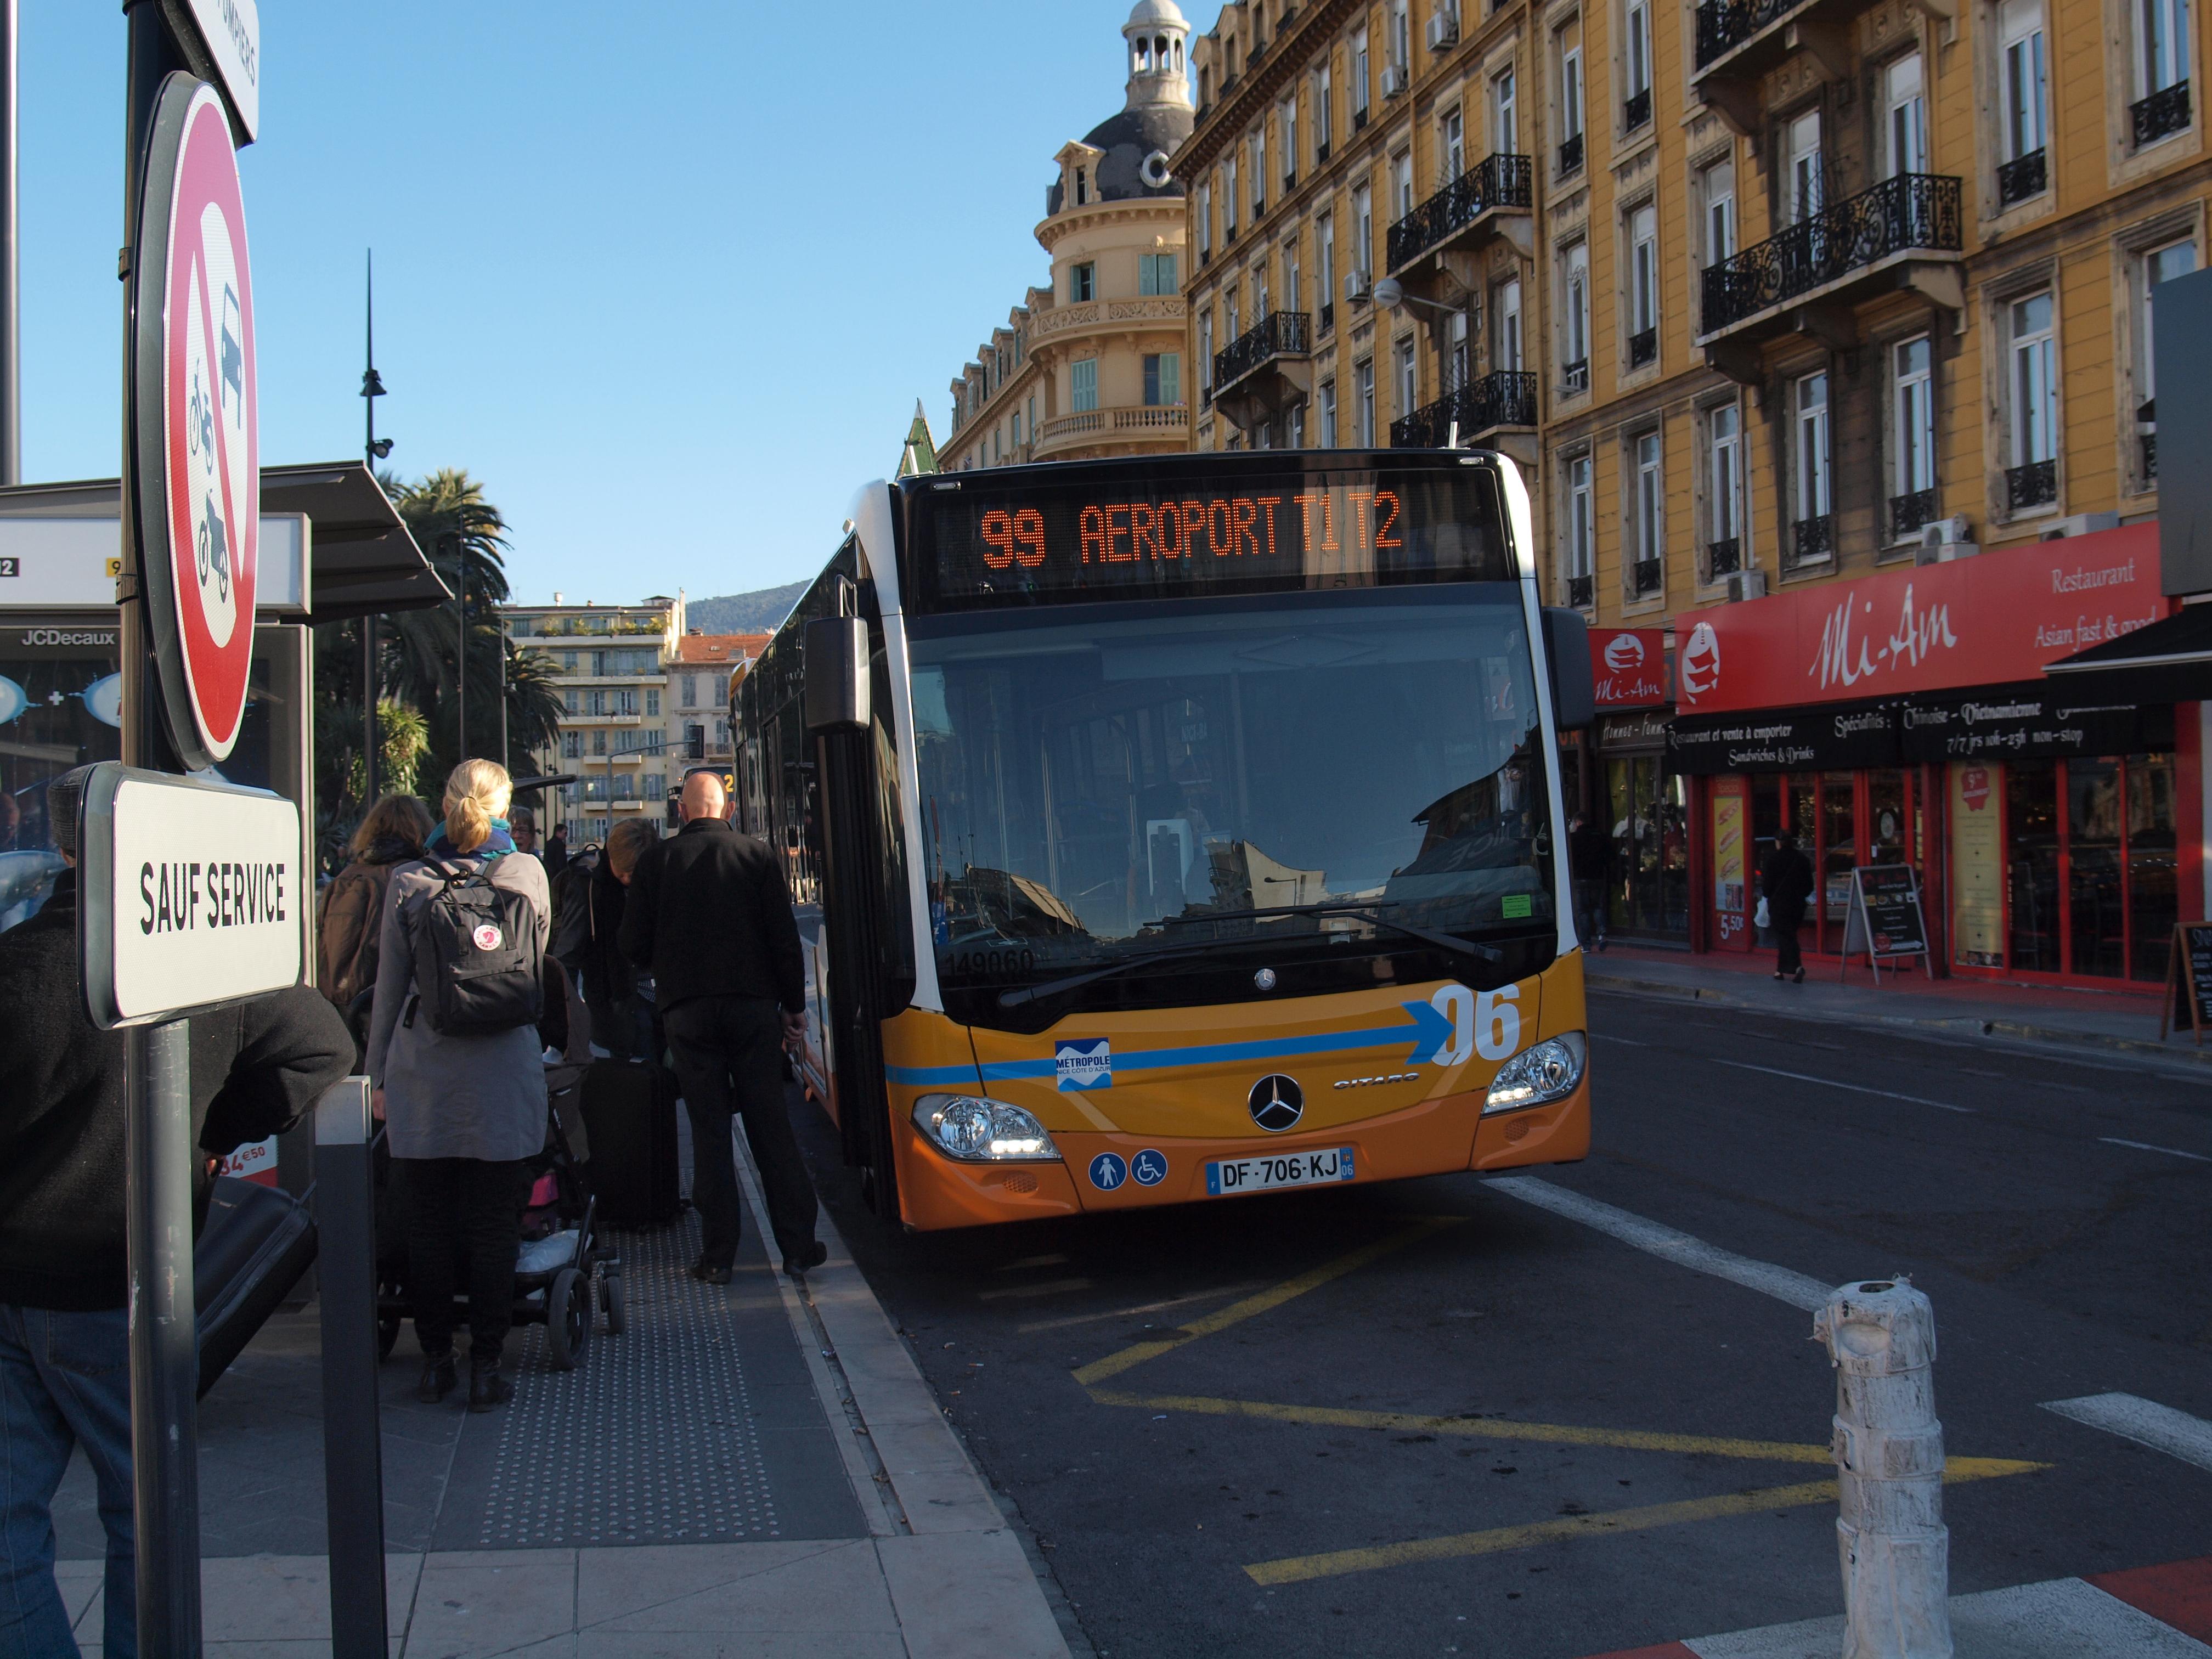 FileNice Bus 99